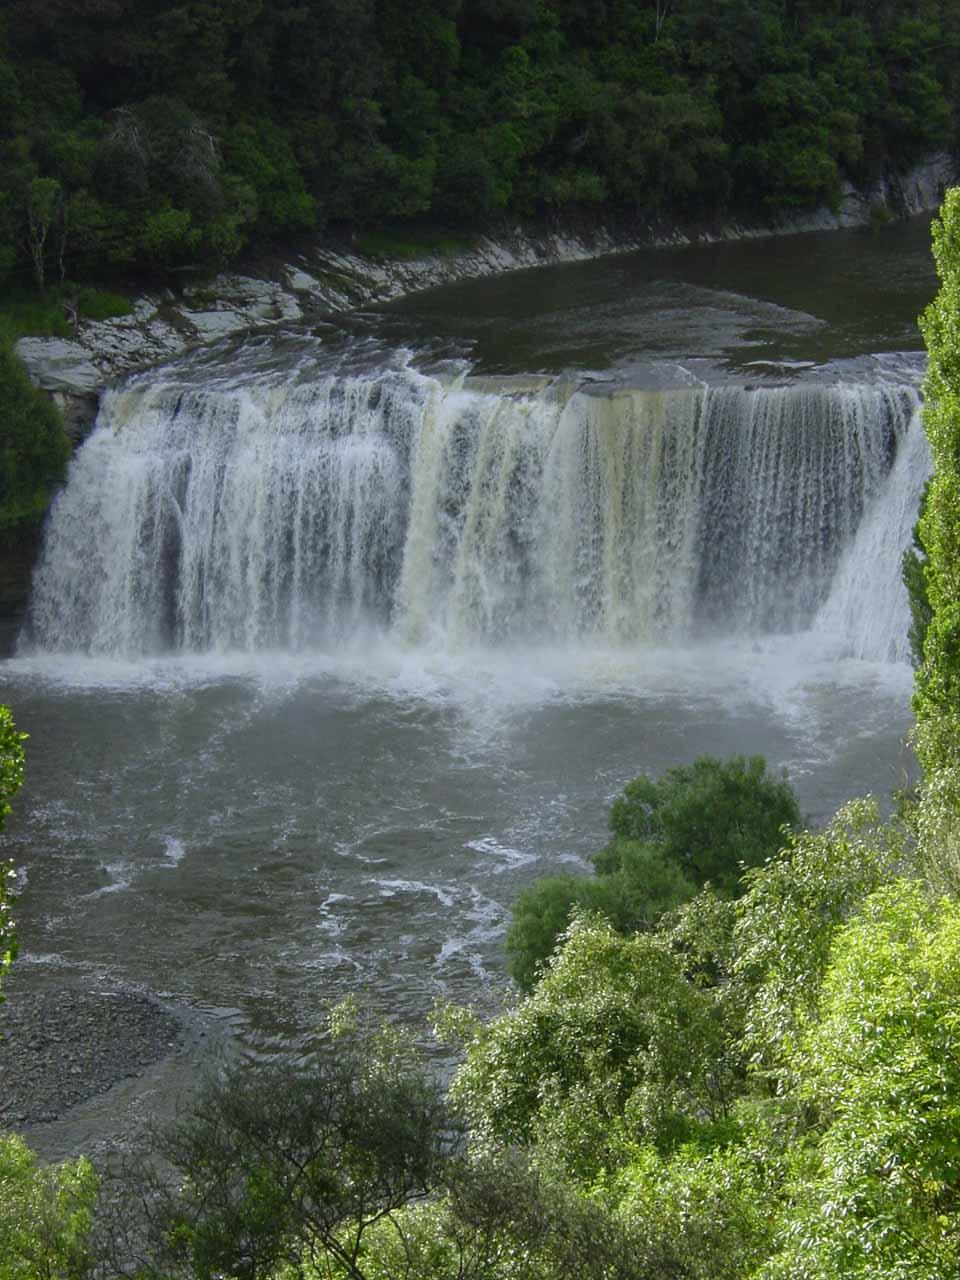 Closer portrait shot of Raukawa Falls from 2004